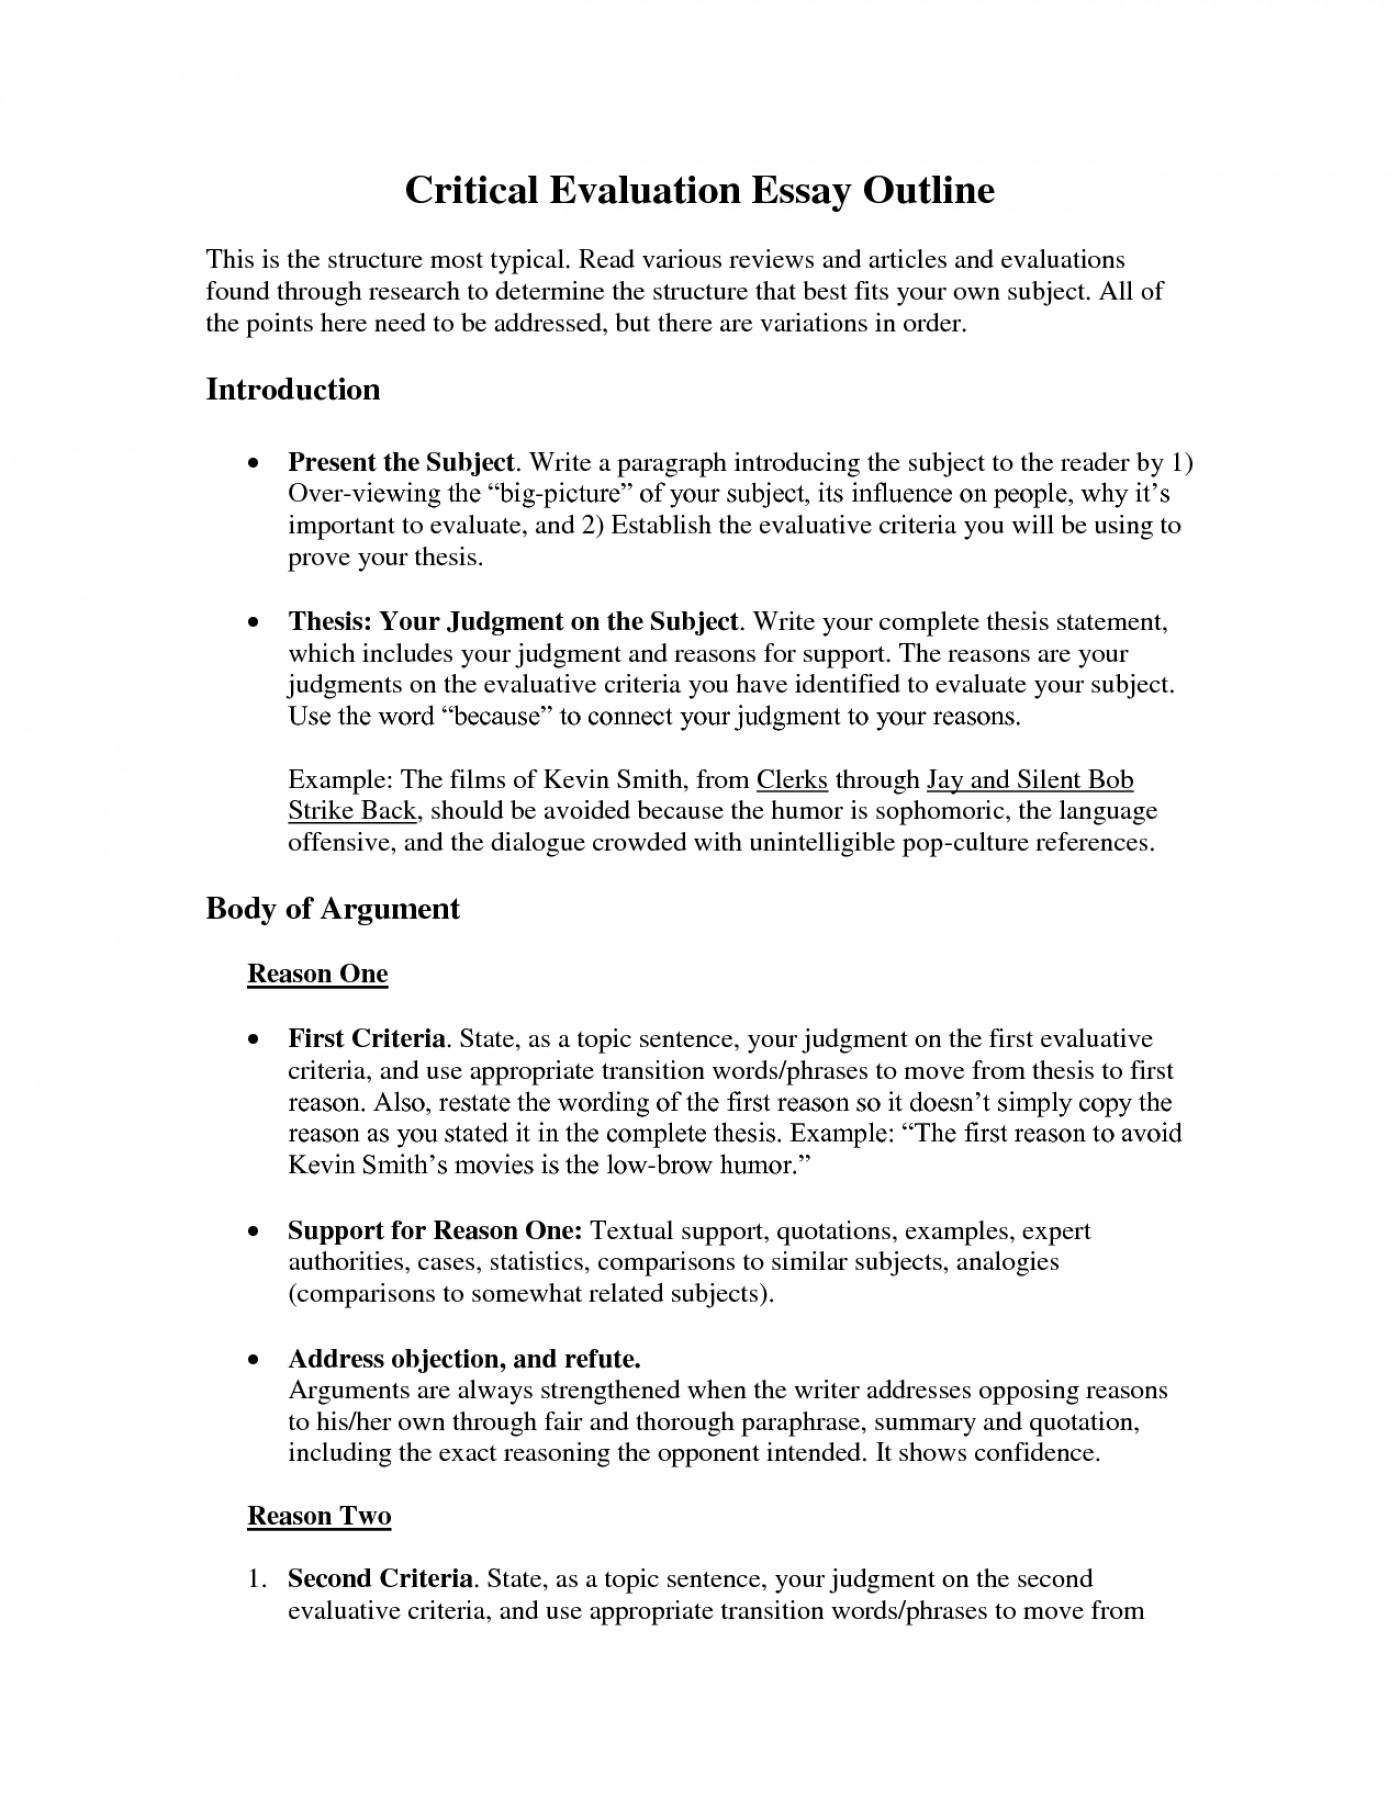 Evaluation research paper sample paul wittek ghazi thesis